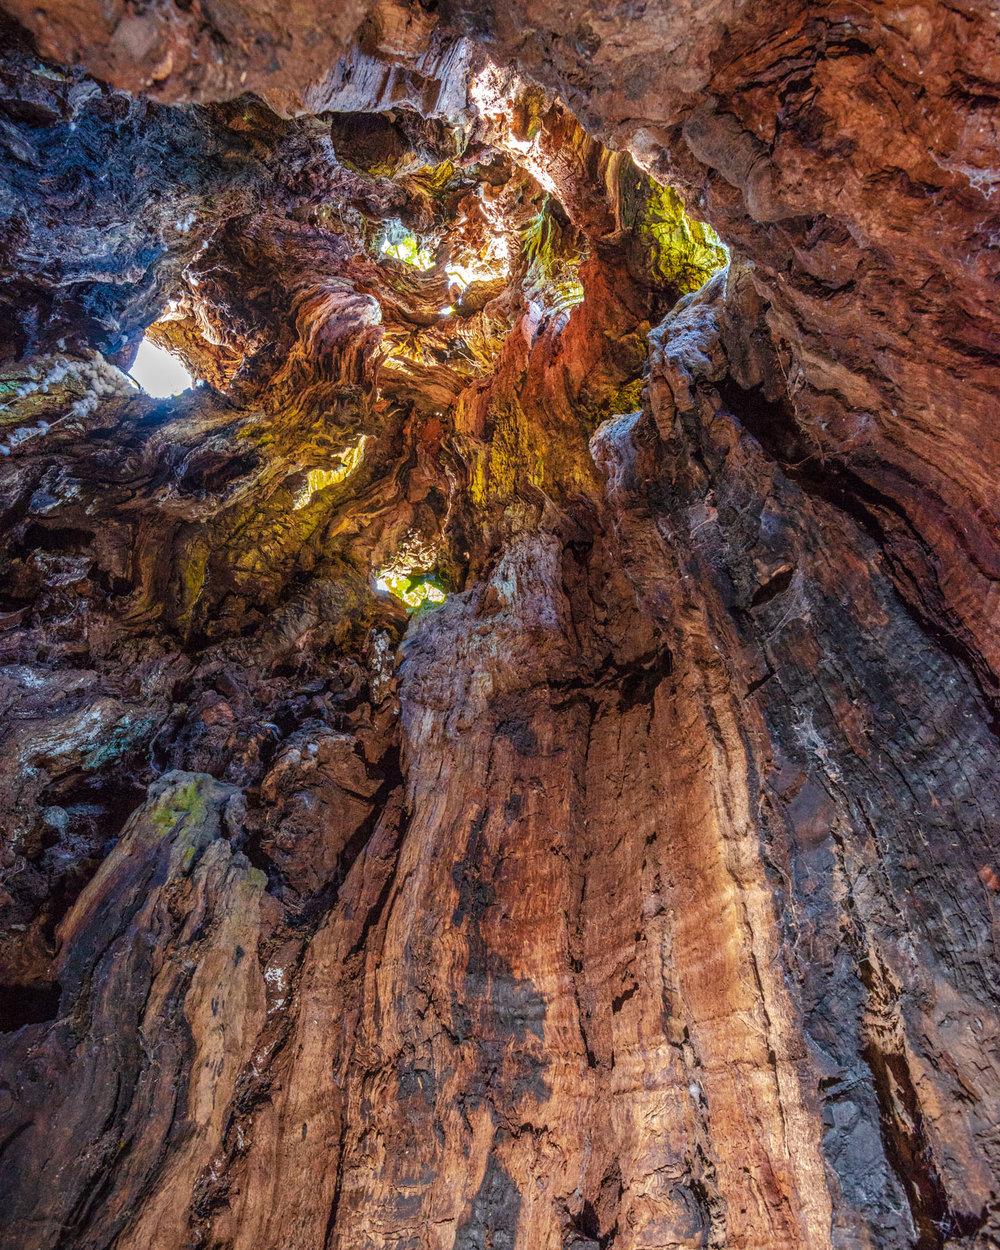 Inside the Pwllpriddog Oak